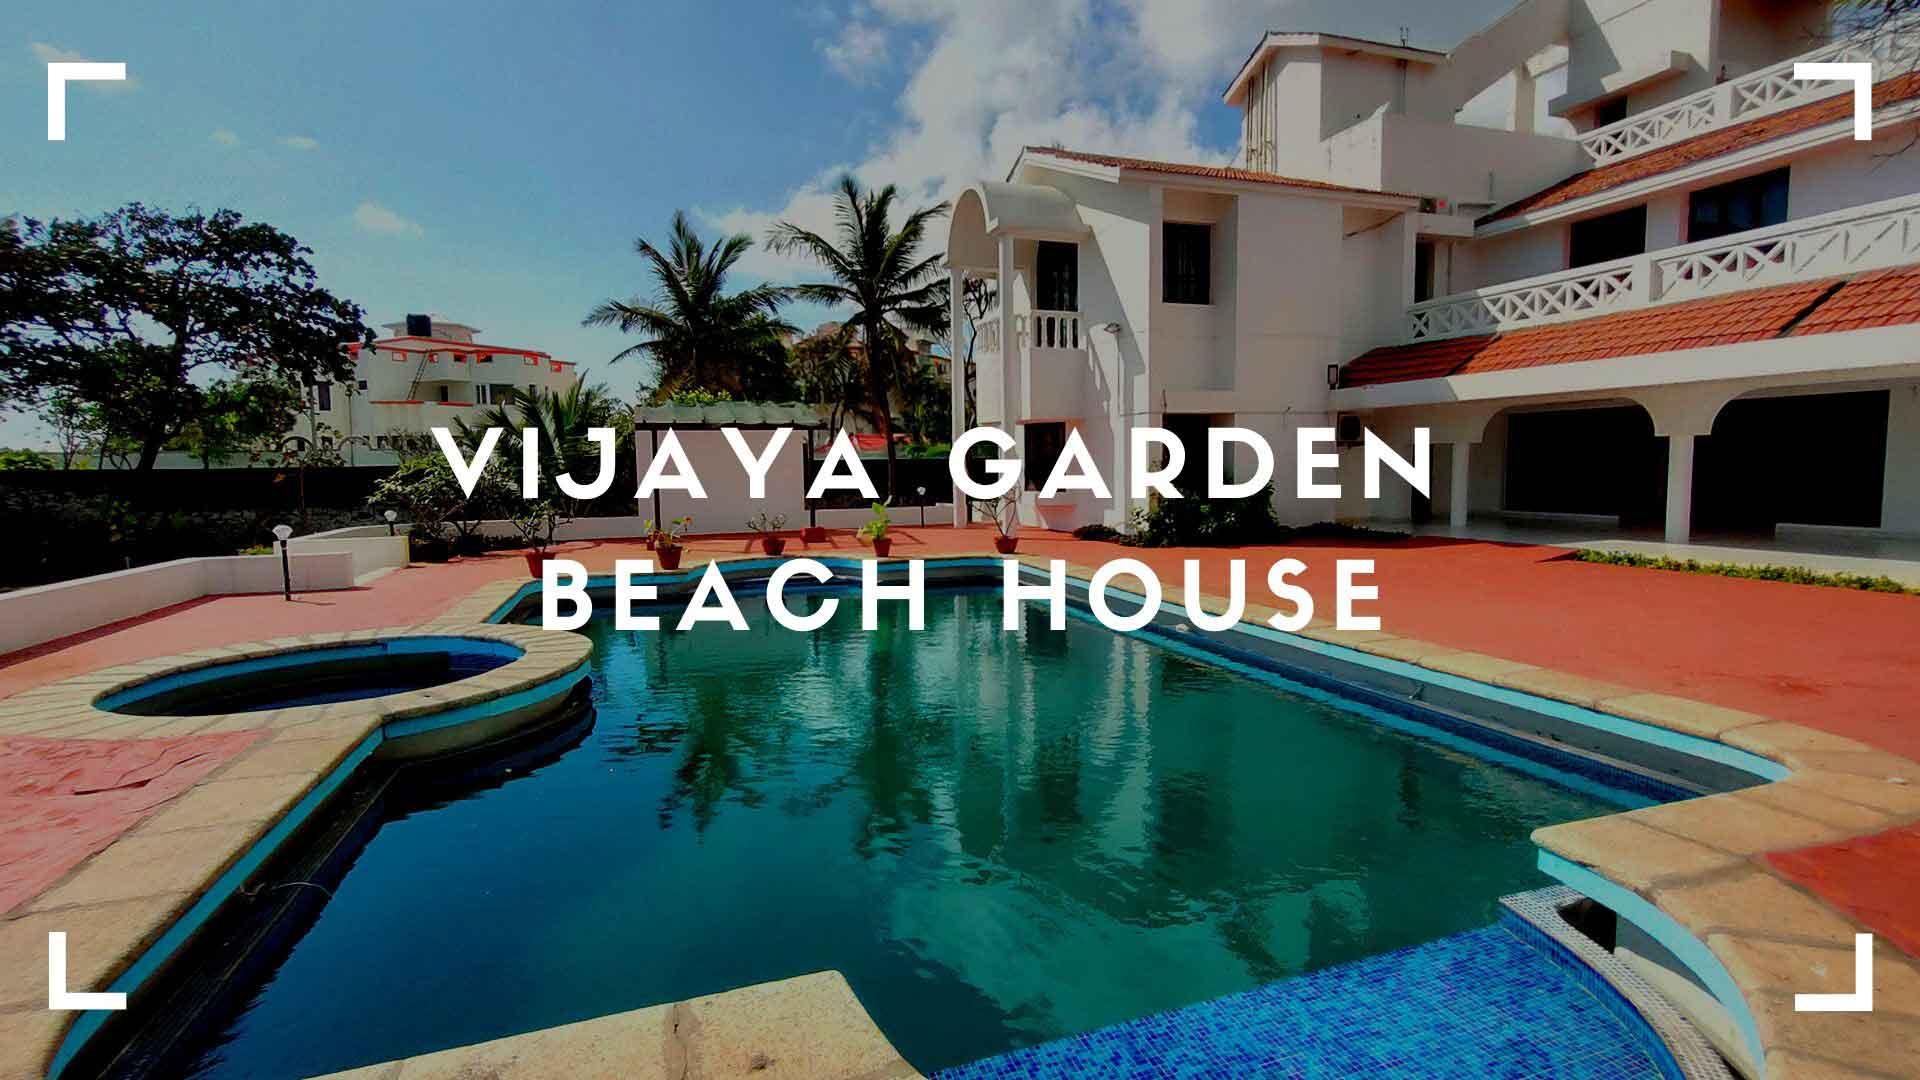 vijaya garden beach house